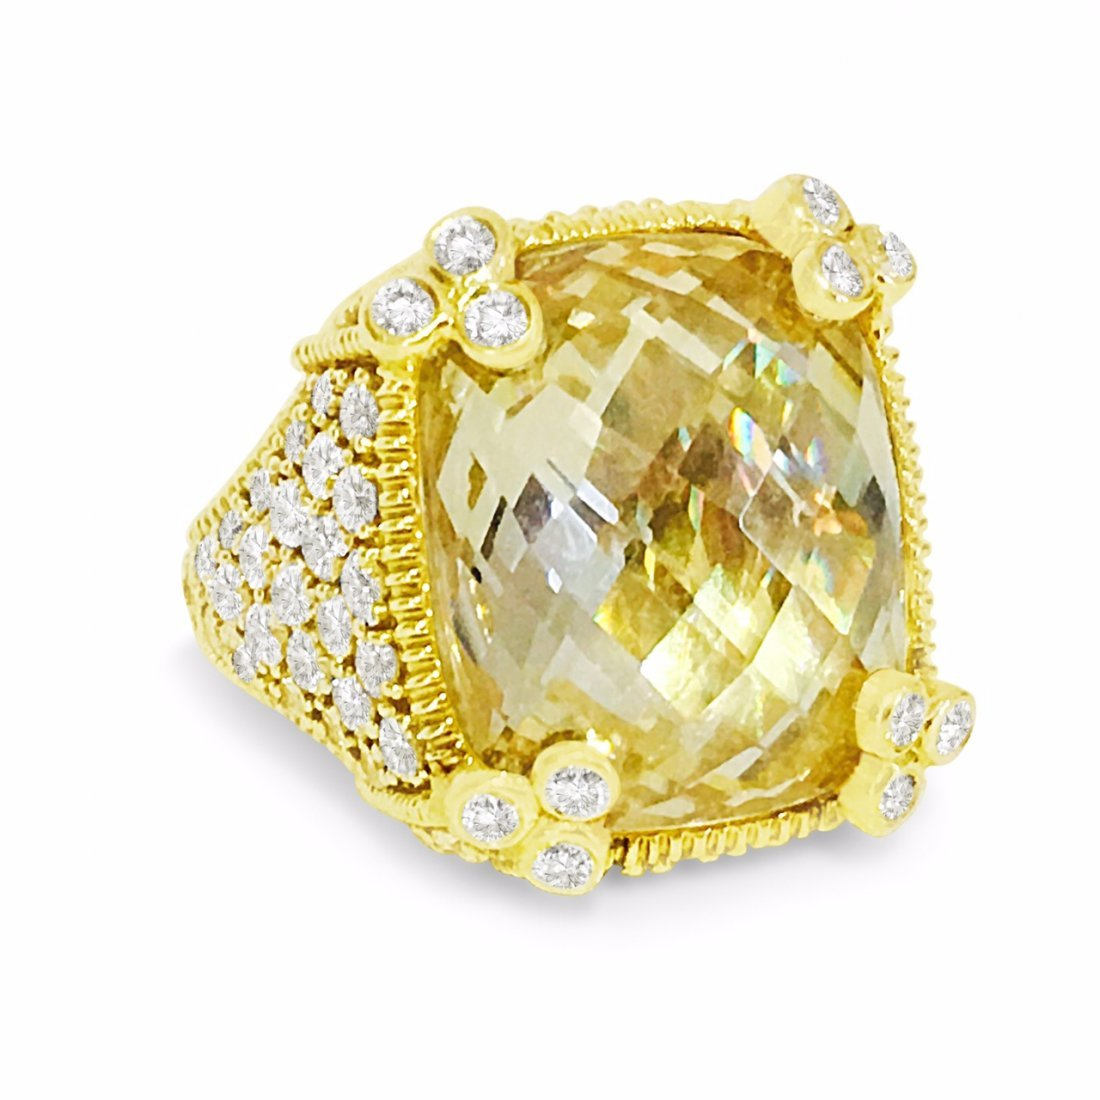 Judith Ripka 18K Gold Natural Diamond Cocktail Ring